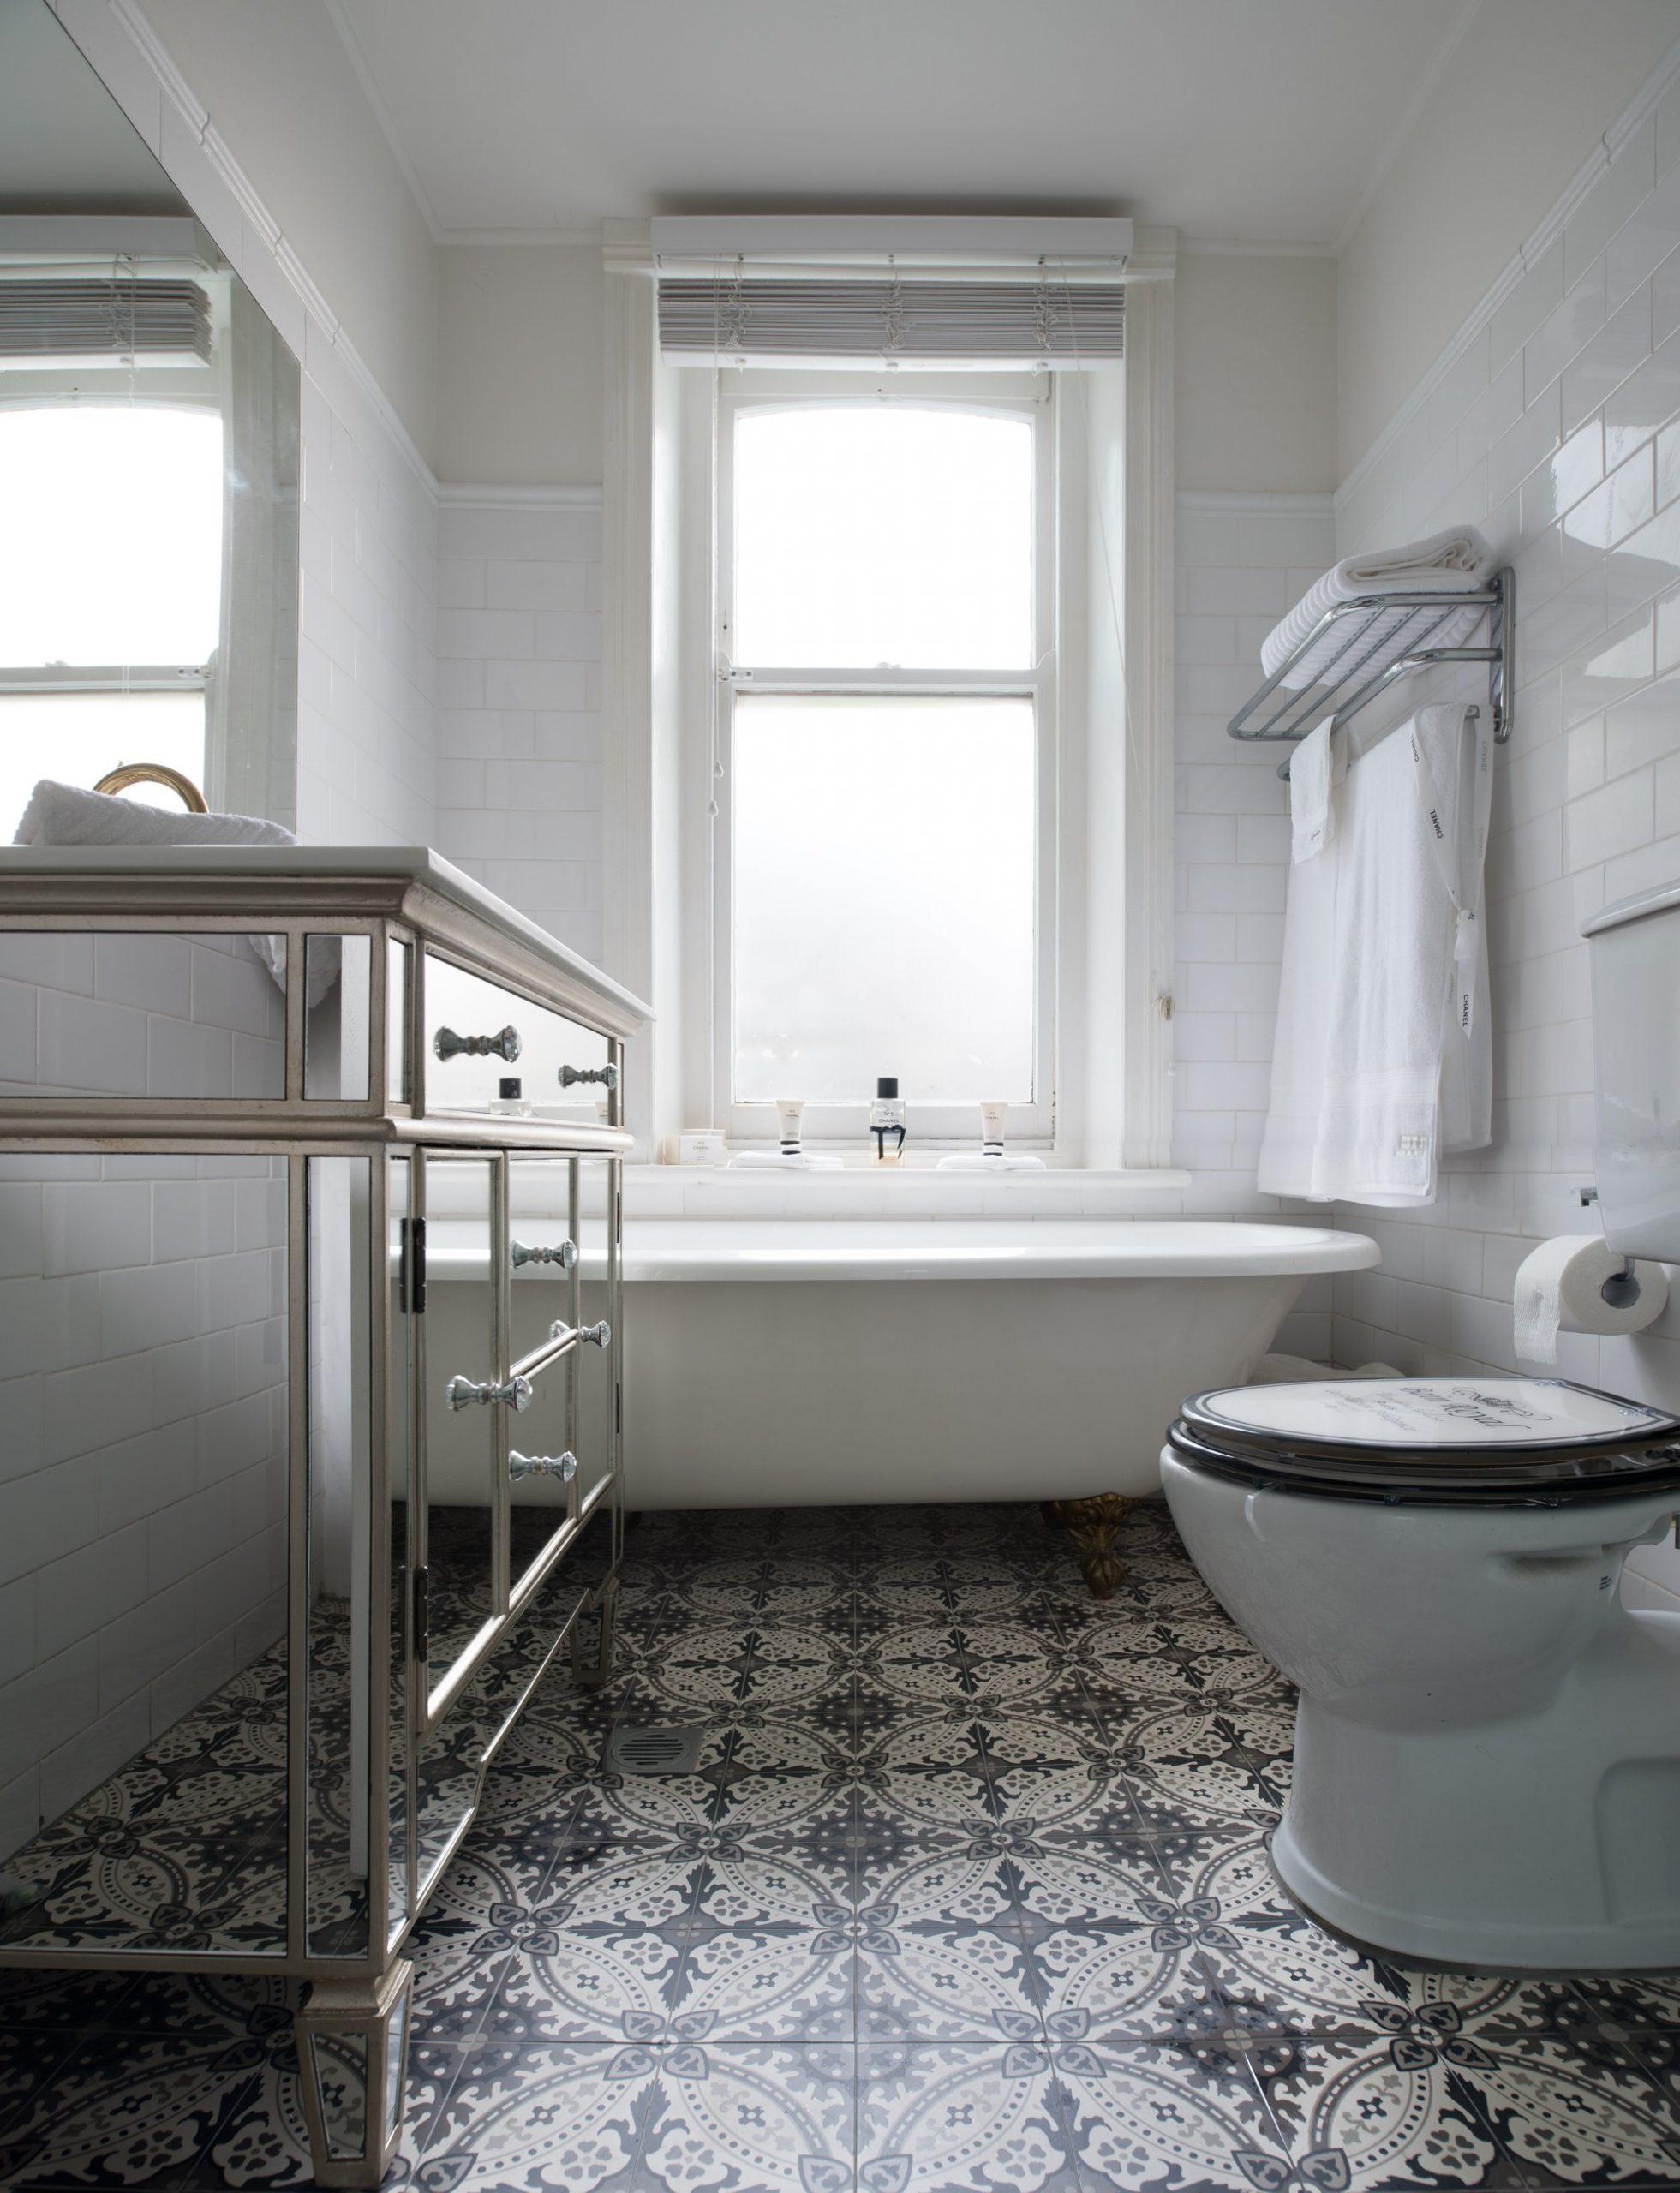 Federation Bathroom Renovation Sytle